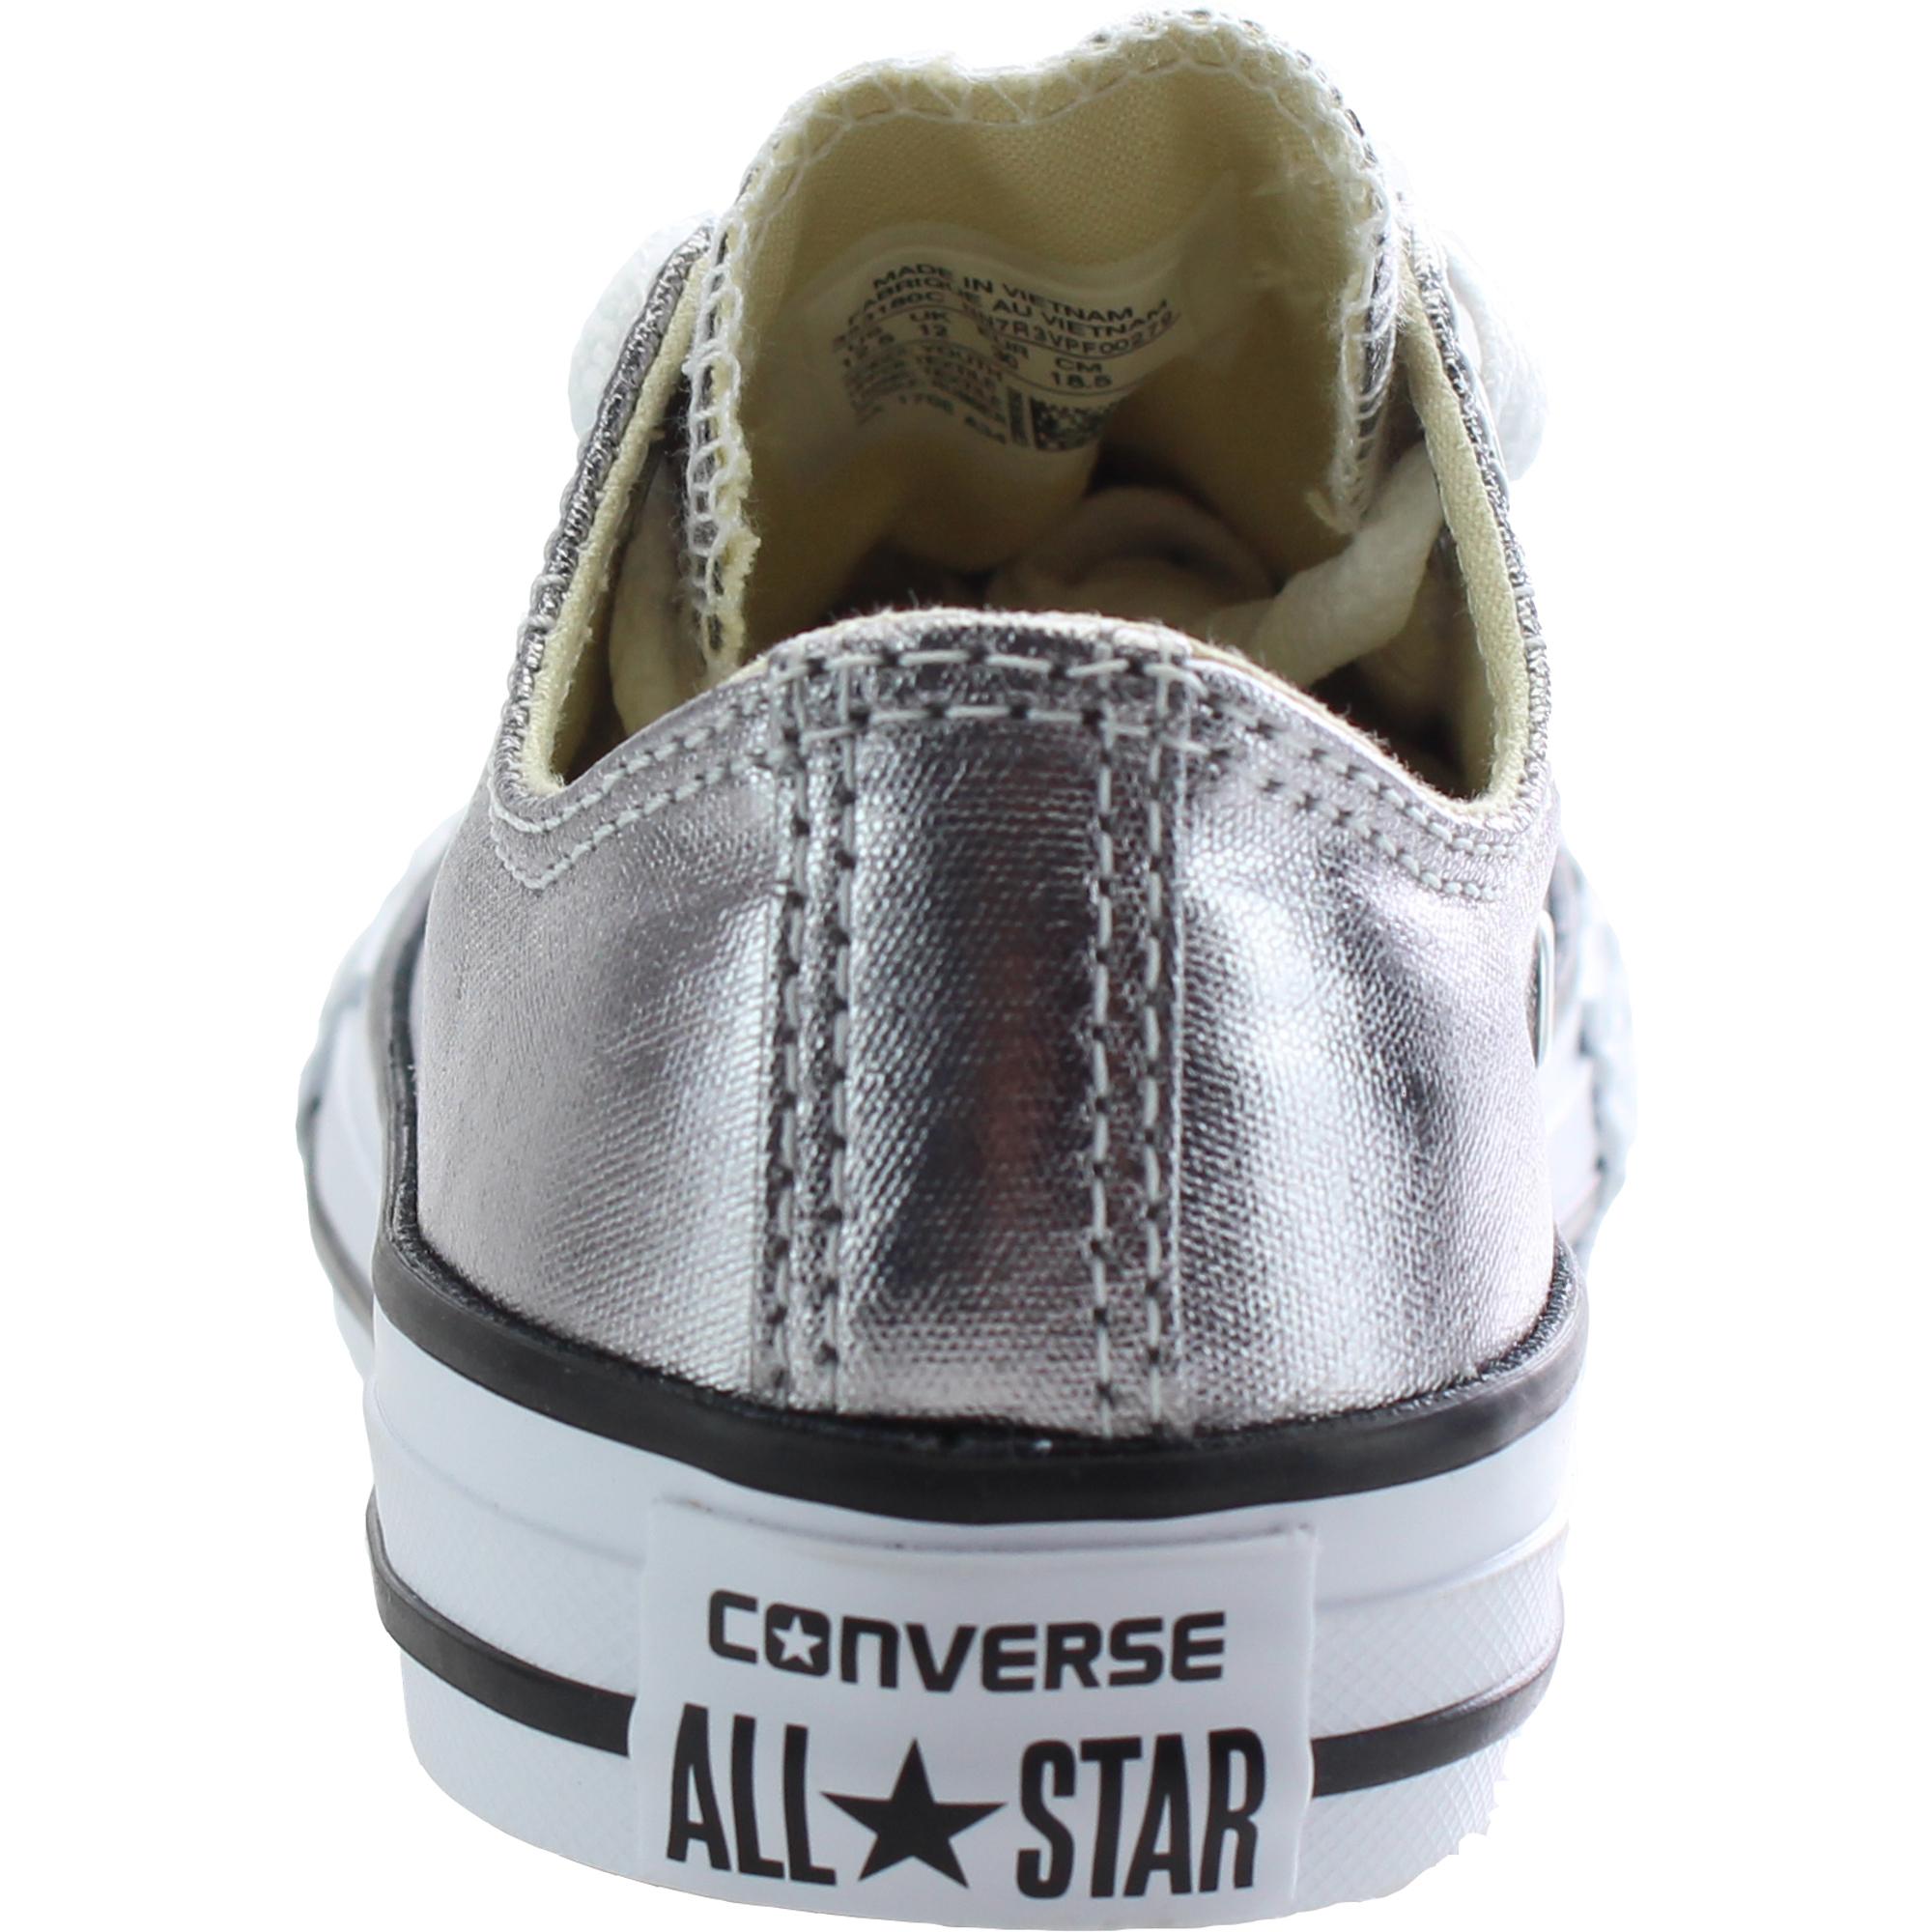 Converse Chuck Taylor All Star Ox Metallic Gunmetal Textile Junior